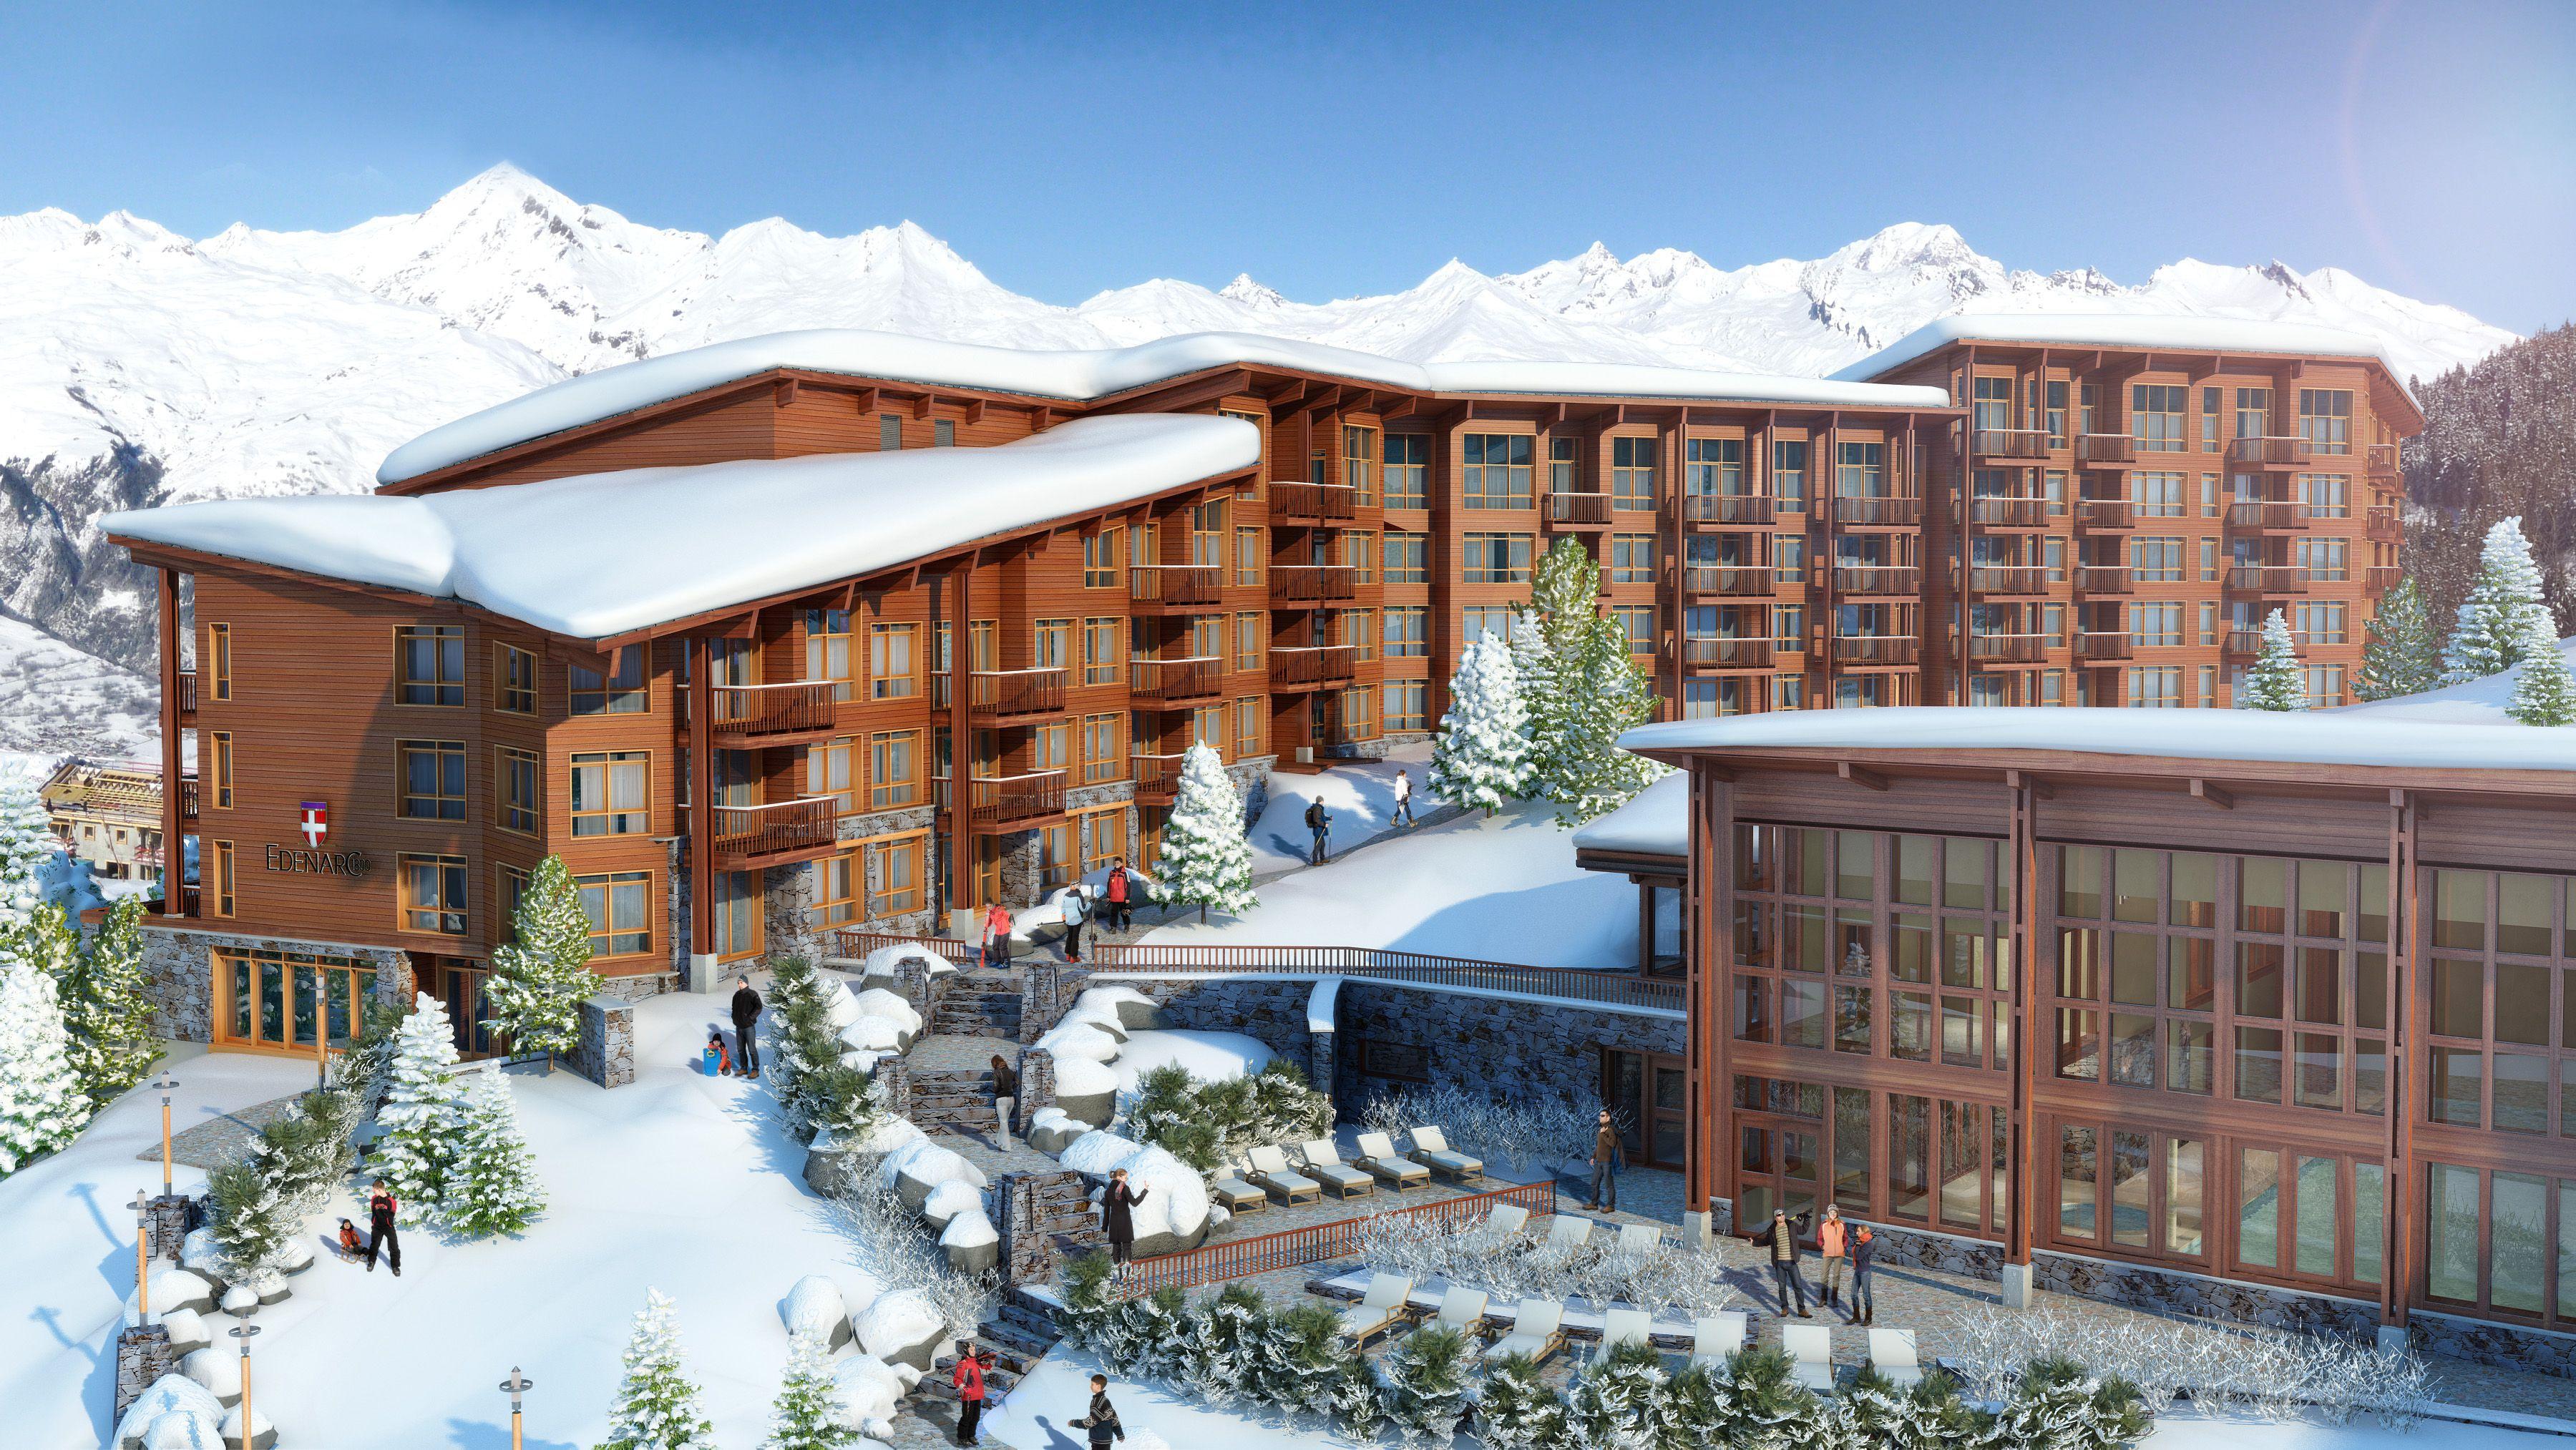 Edenark hotel in the ski resort of les arcs france for Hotels in france